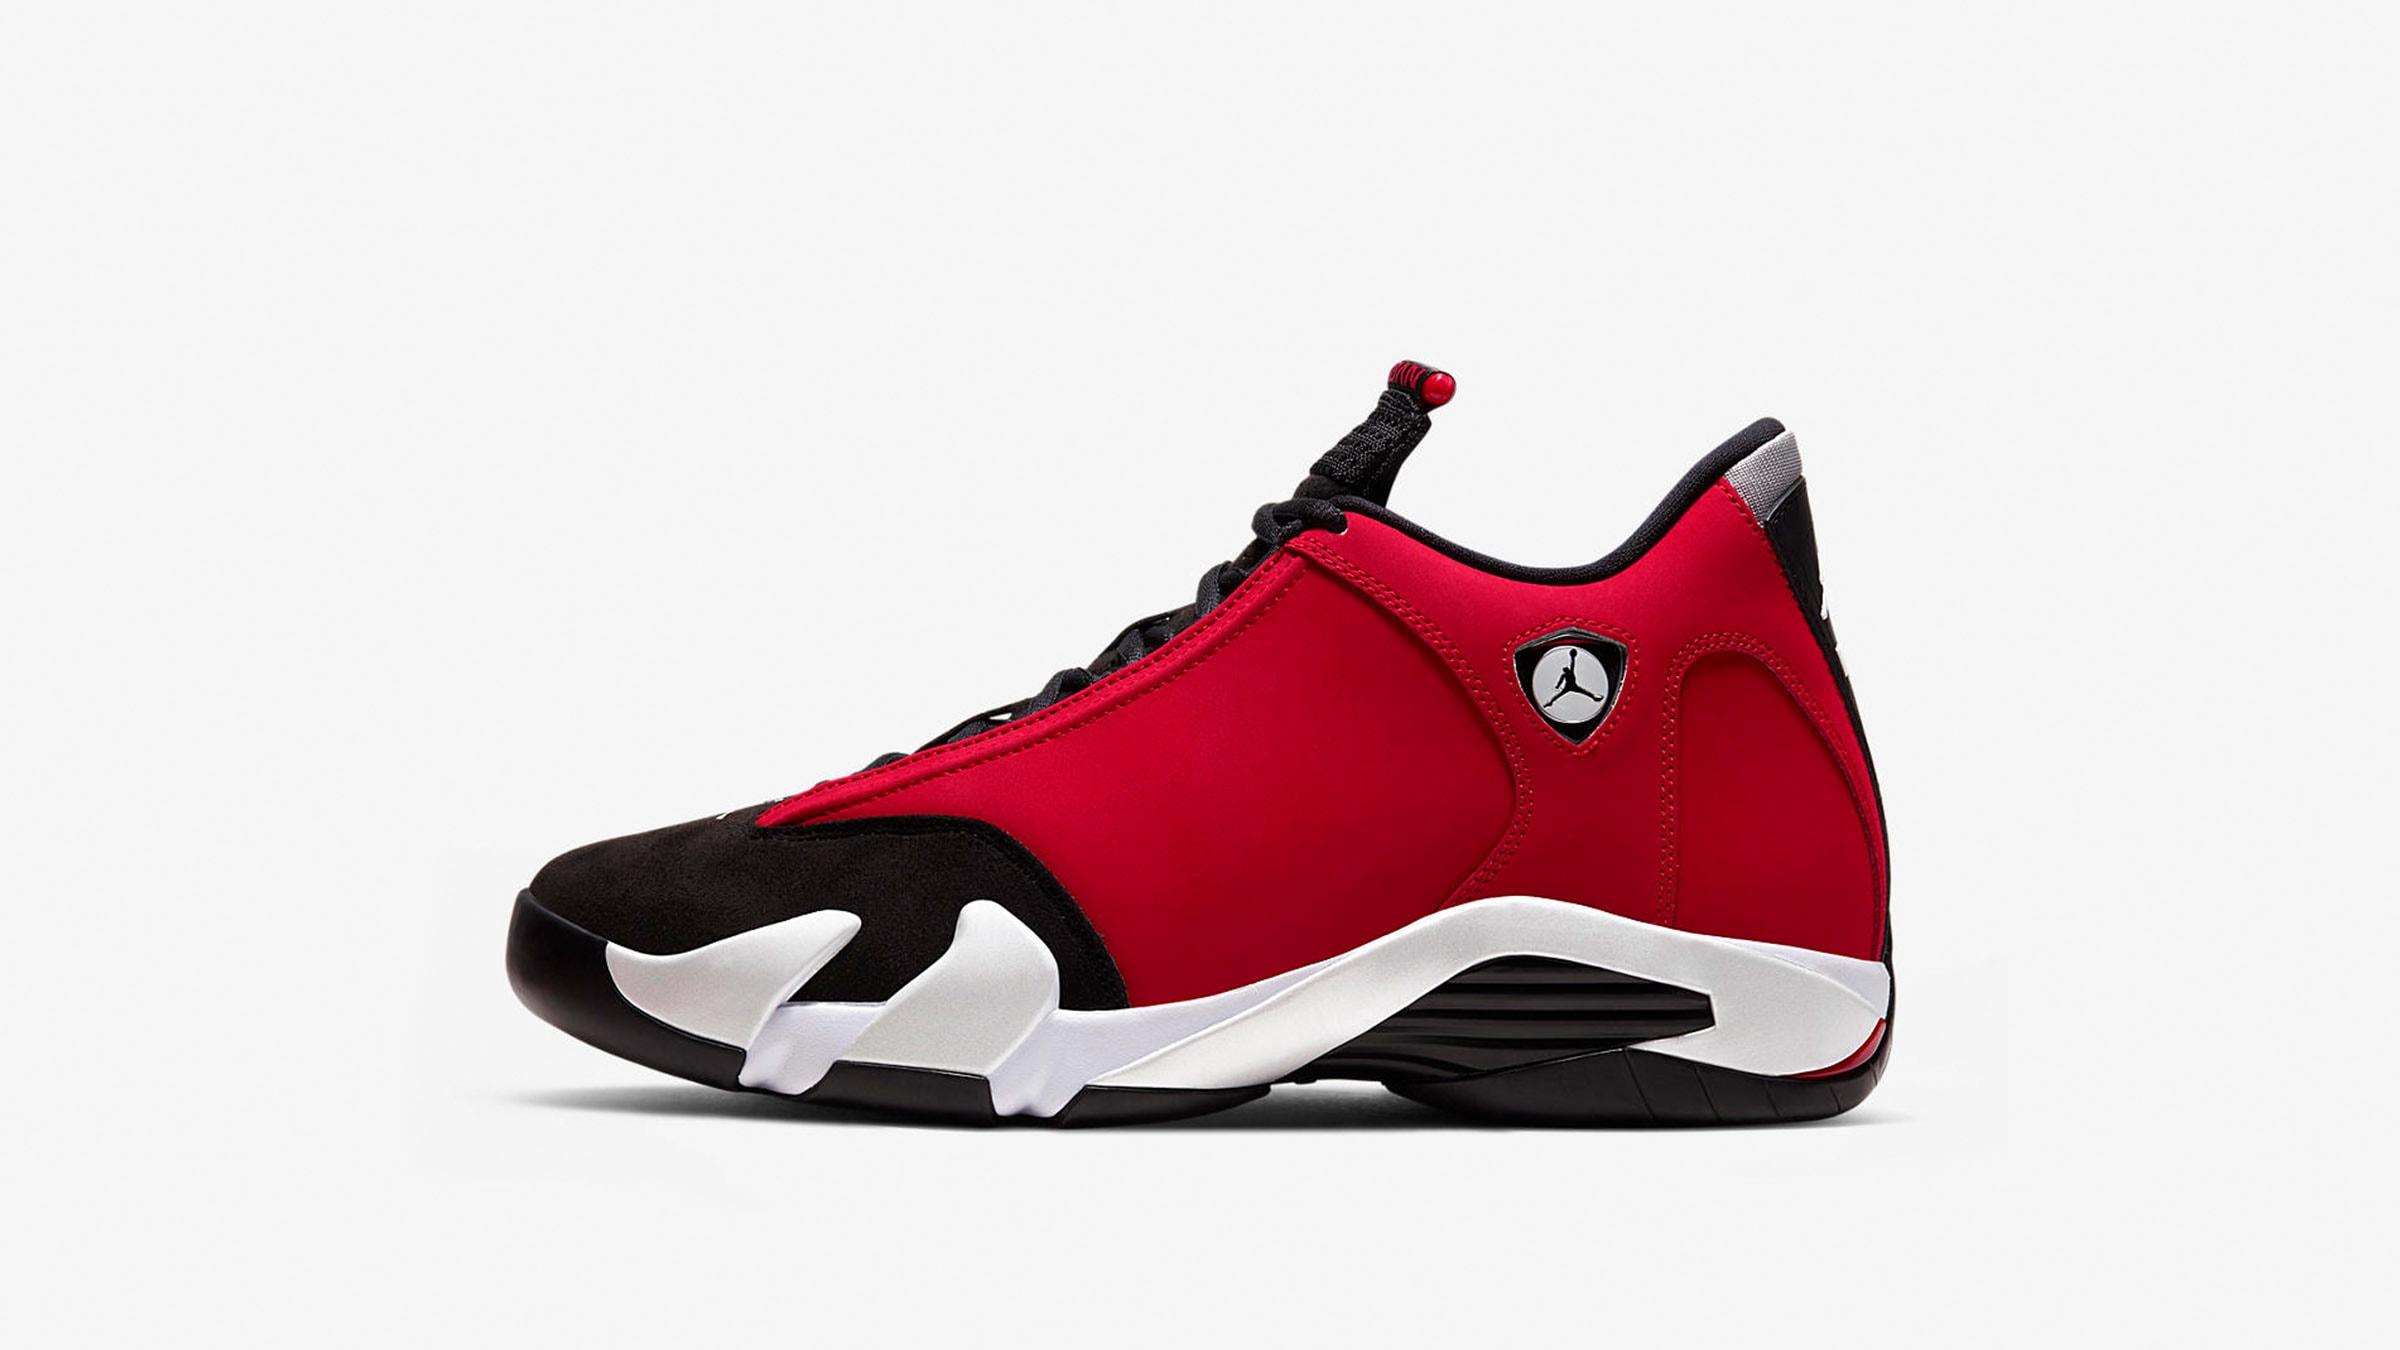 Air Jordan 14 Retro (Black, Gym Red